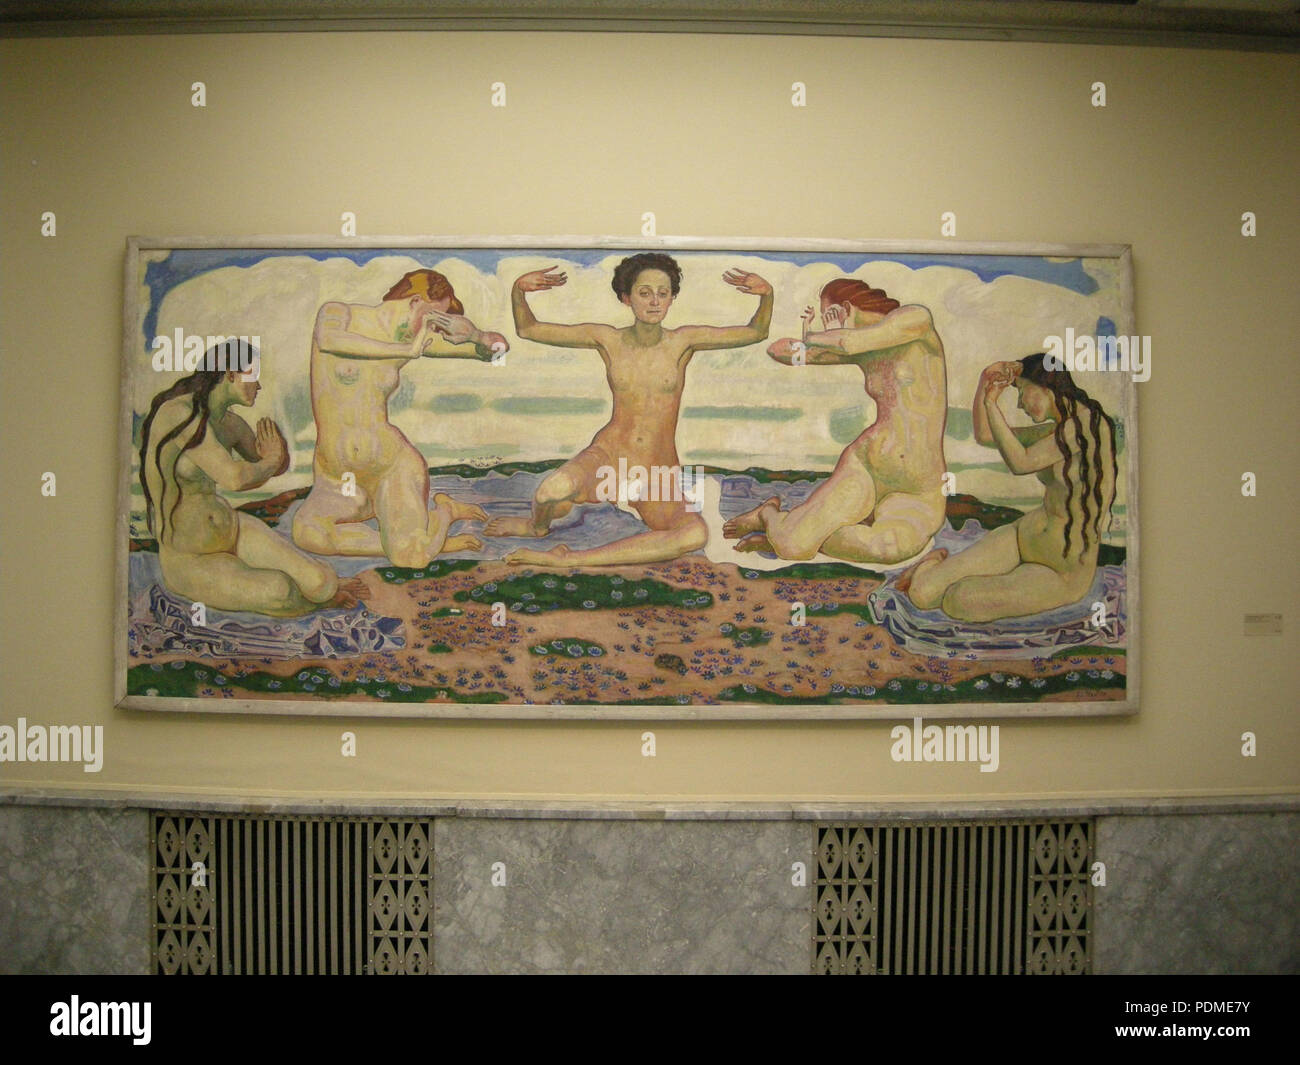 20 Kunsthaus di Zurigo, interno, Ferdinand Hodler, der tag, 1904-1907 Immagini Stock